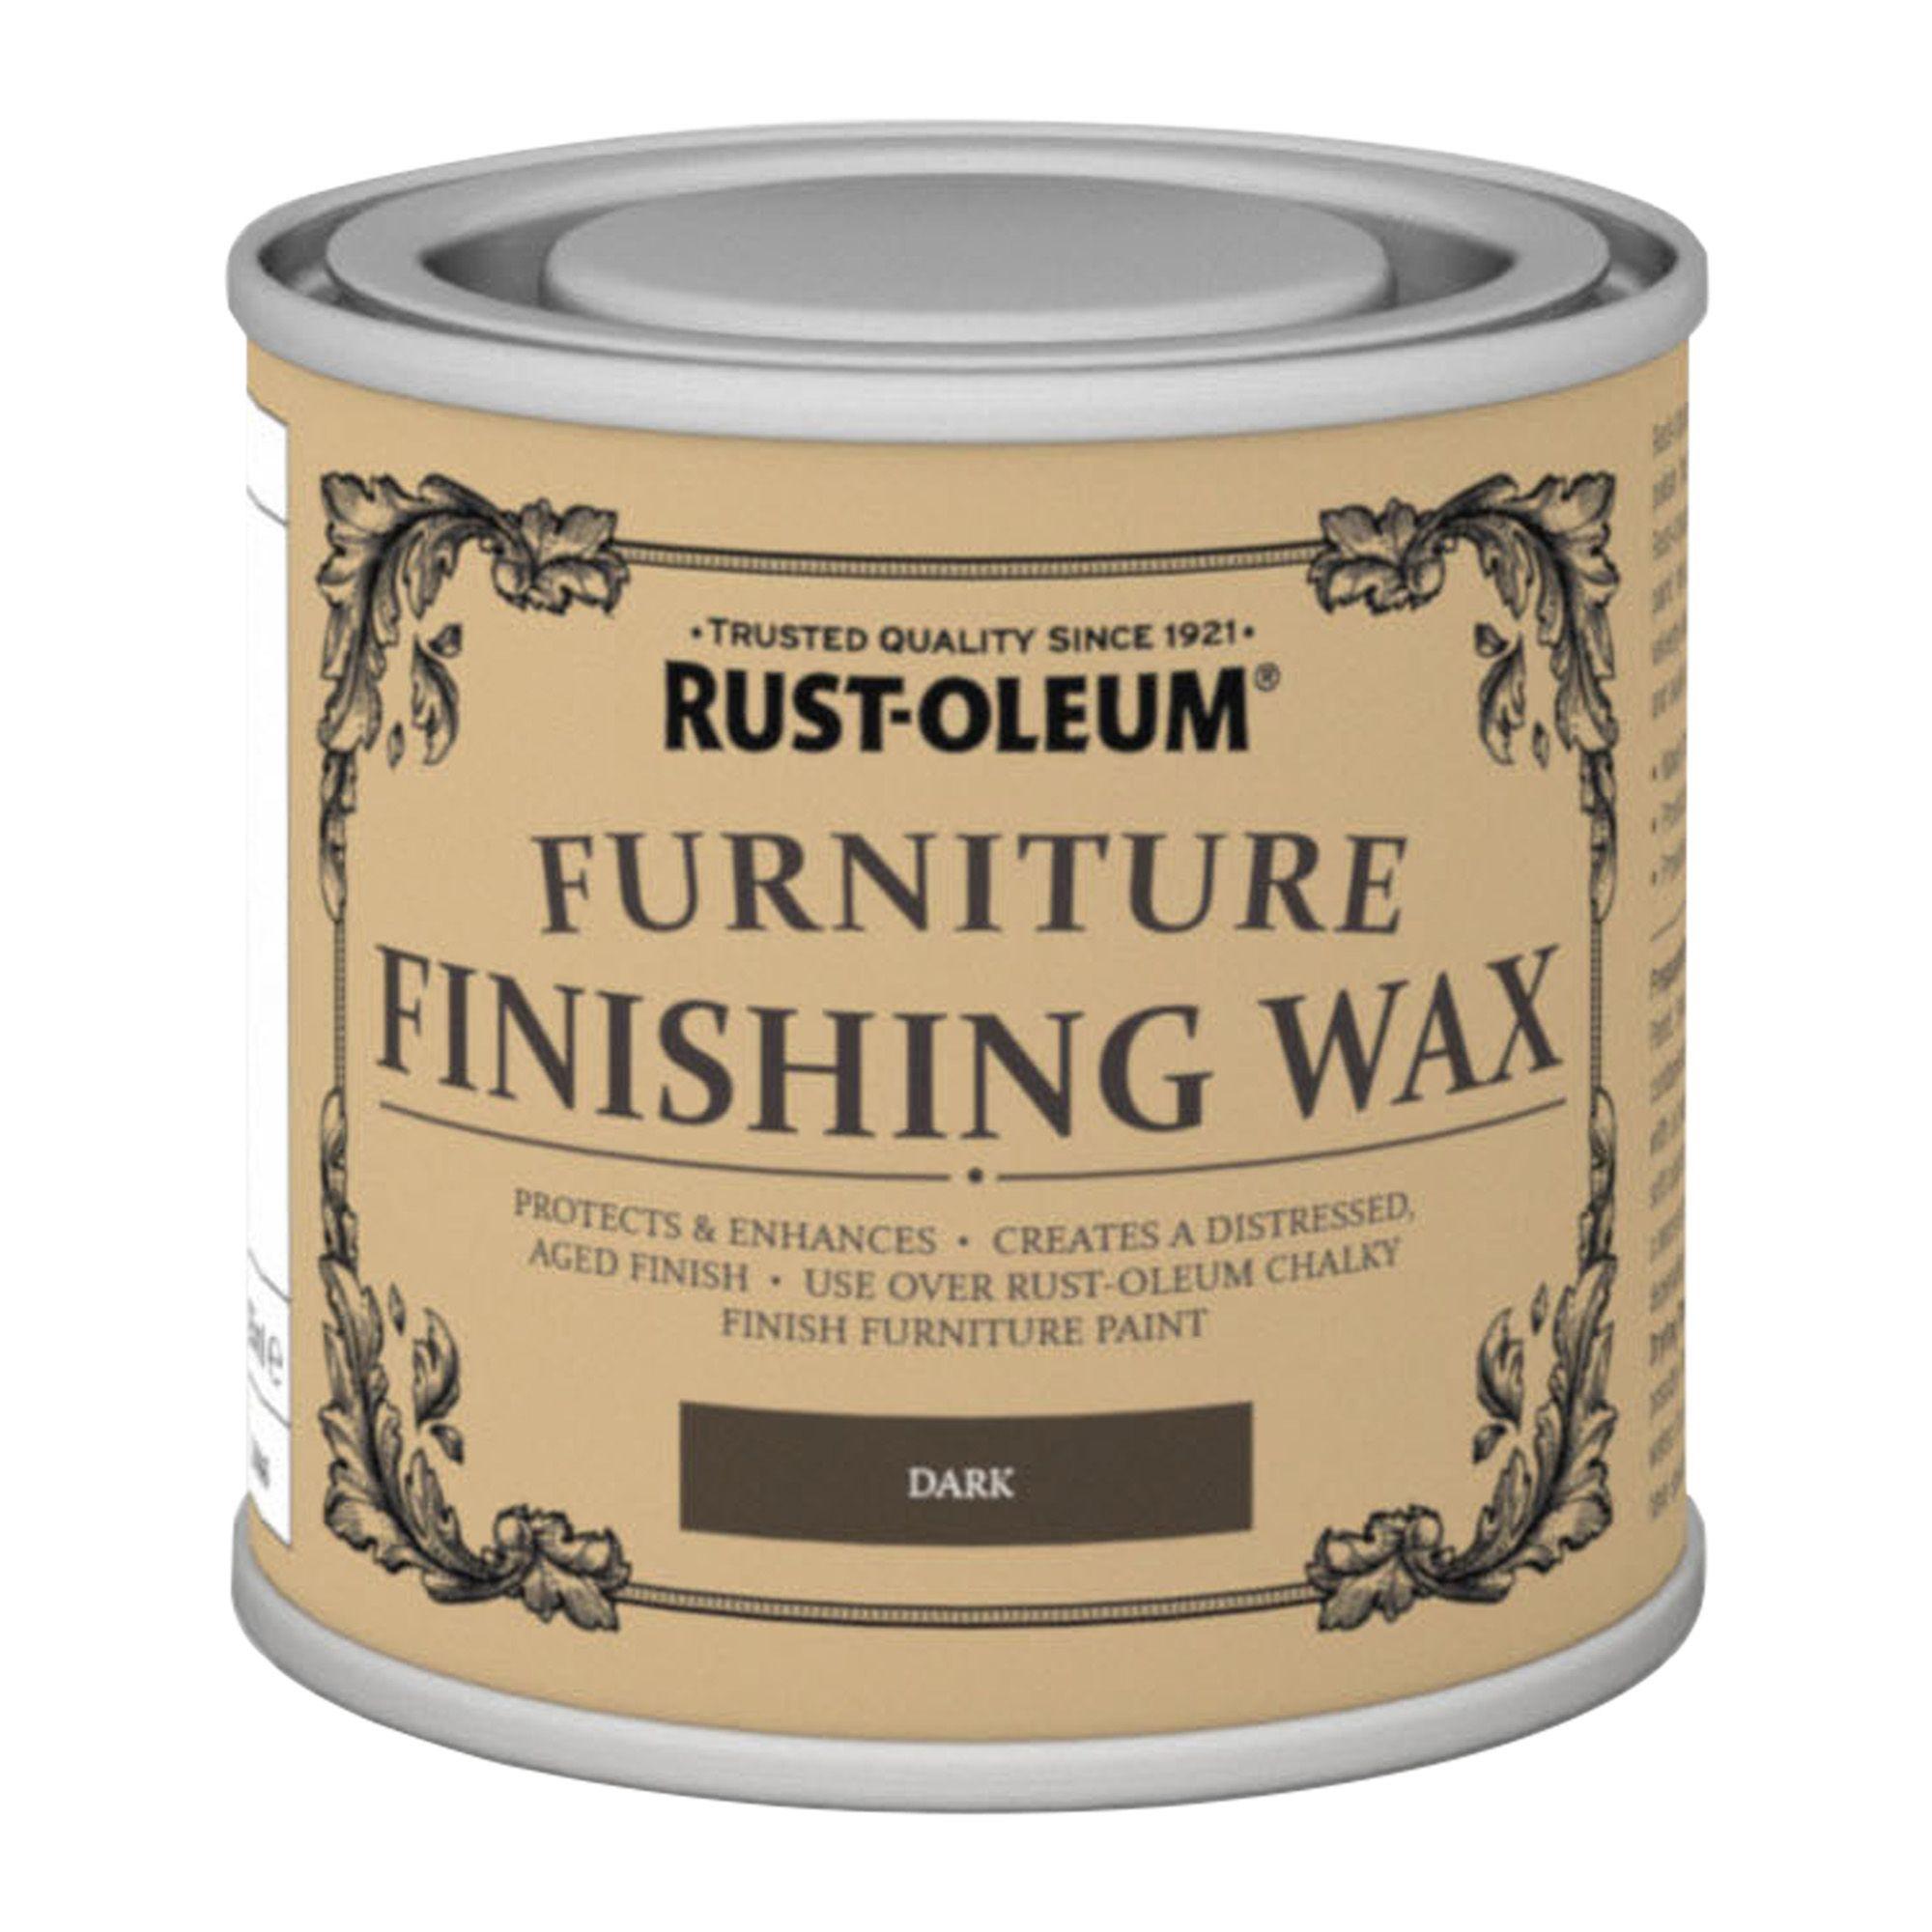 Rust Oleum Dark Furniture Finishing Wax 125ml Rooms